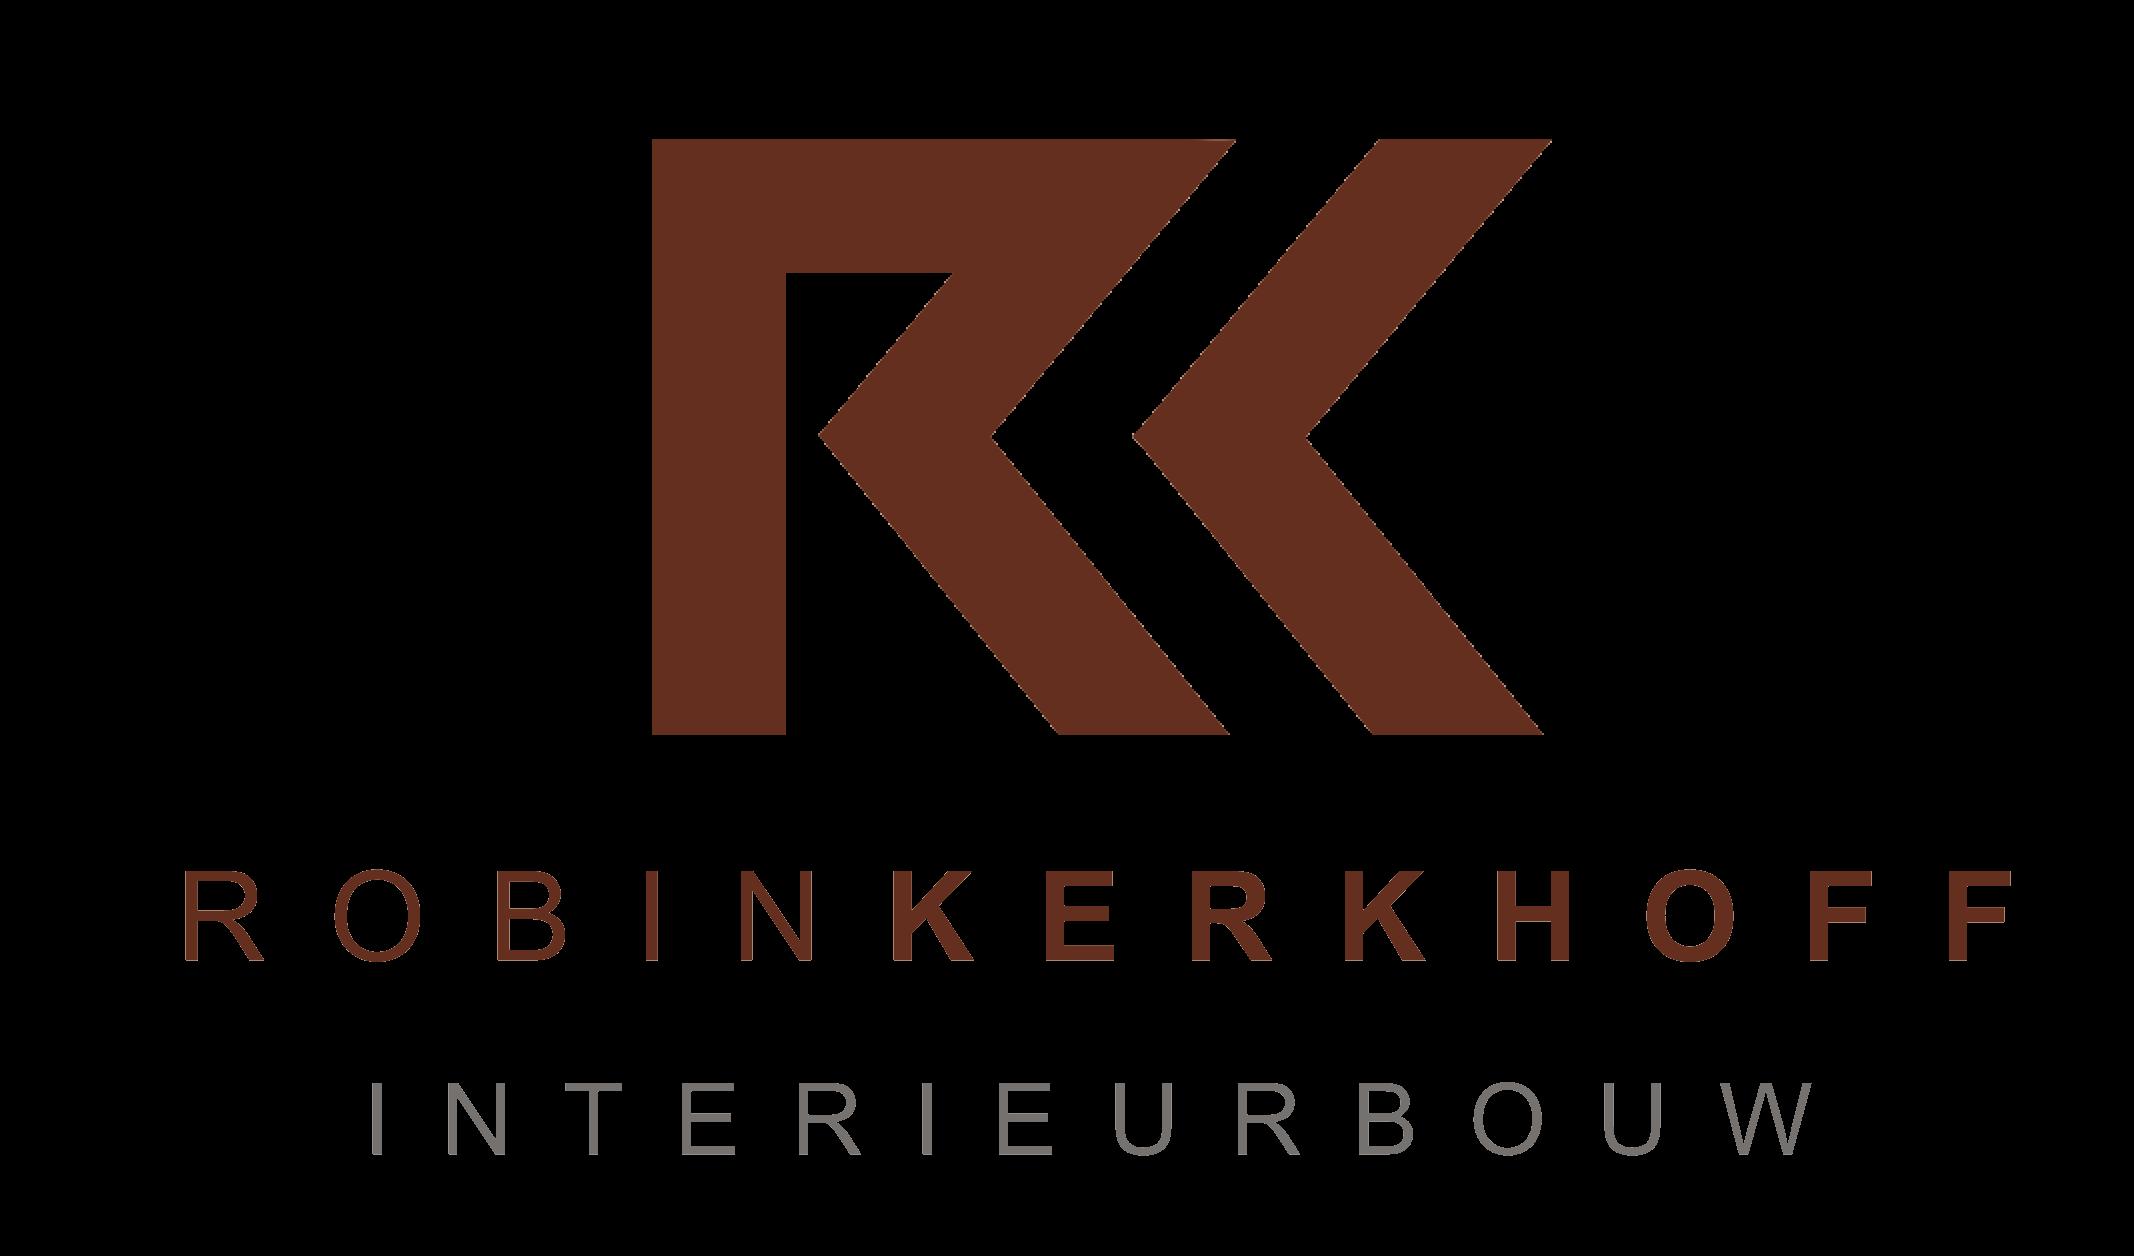 Robin Kerkhoff Interieurbouw Groesbeek